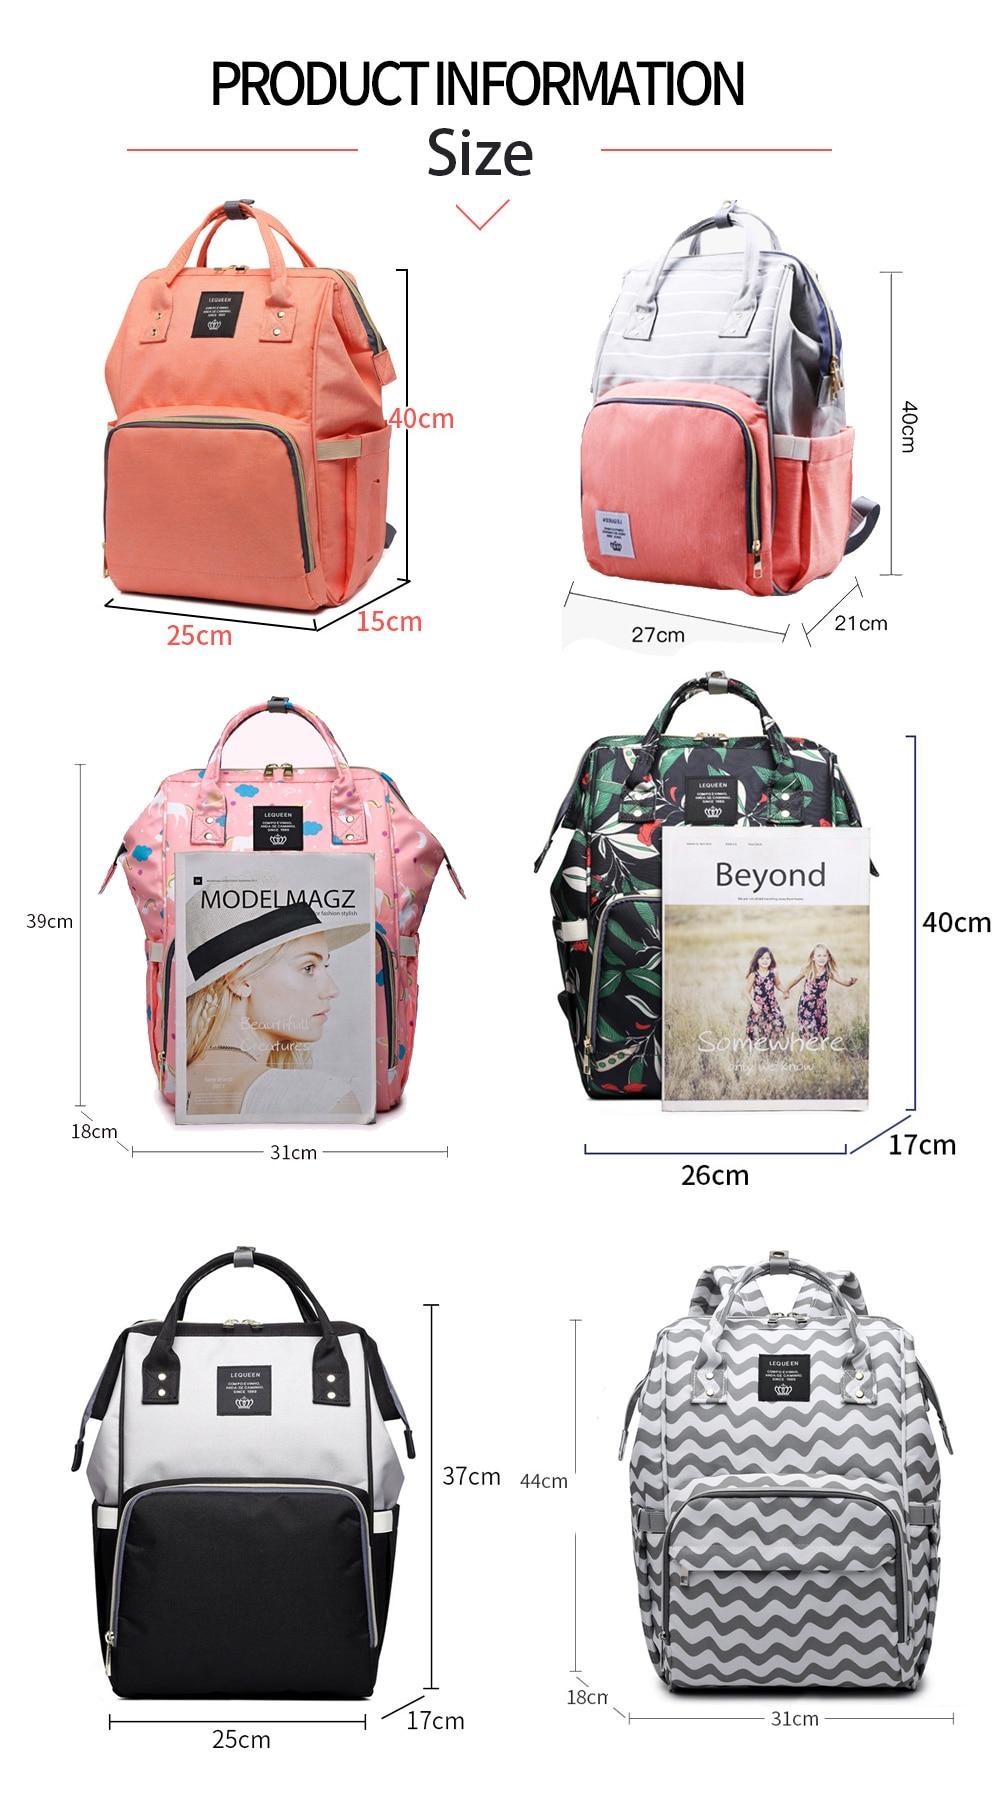 HTB1juijXiYrK1Rjy0Fdq6ACvVXaj Lequeen Fashion Mummy Maternity Nappy Bag Large Capacity Nappy Bag Travel Backpack Nursing Bag for Baby Care Women's Fashion Bag